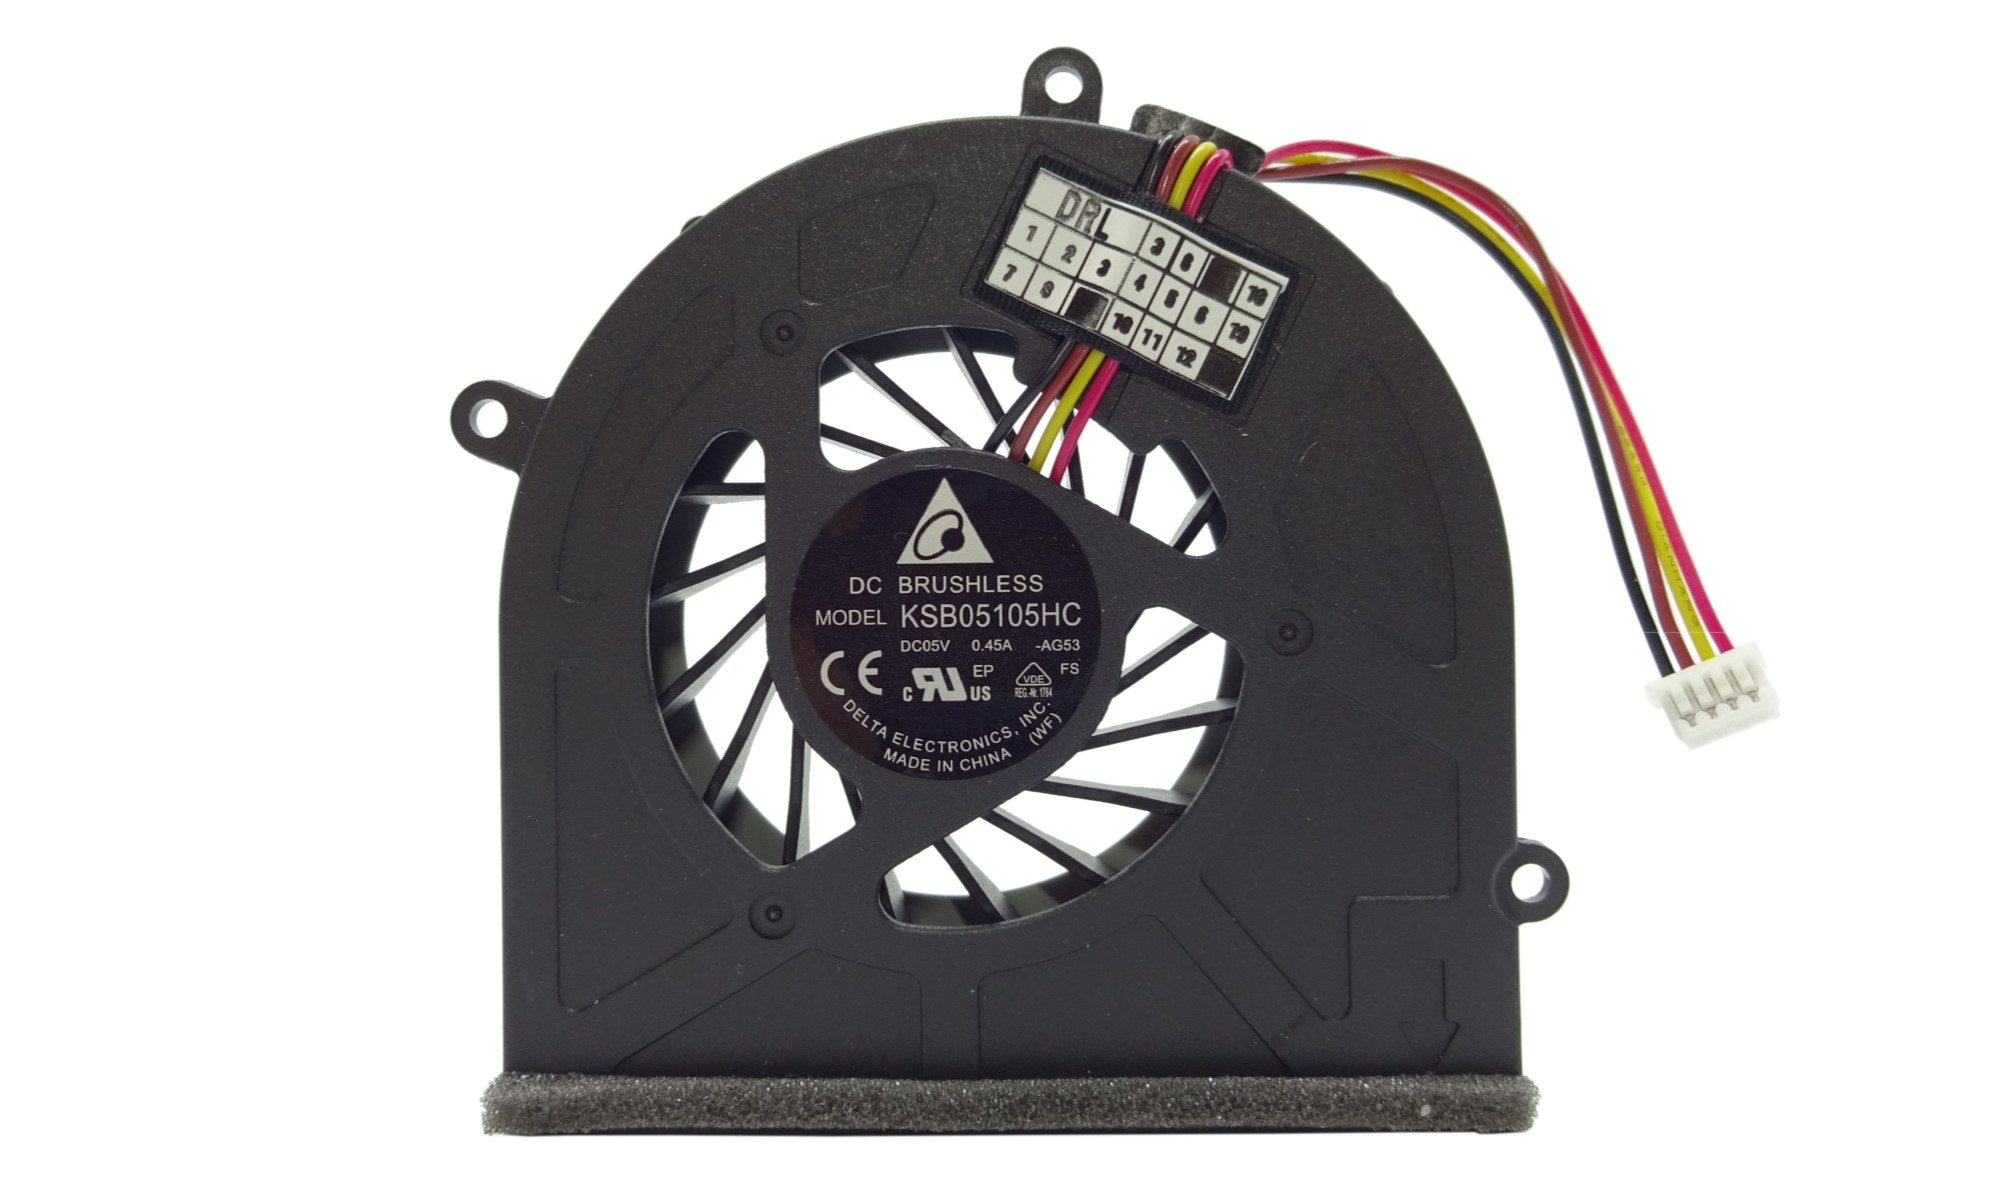 Cooler compatibil Delta Electronics pentru laptop Lenovo IdeaPad G470, G475, G570, G575